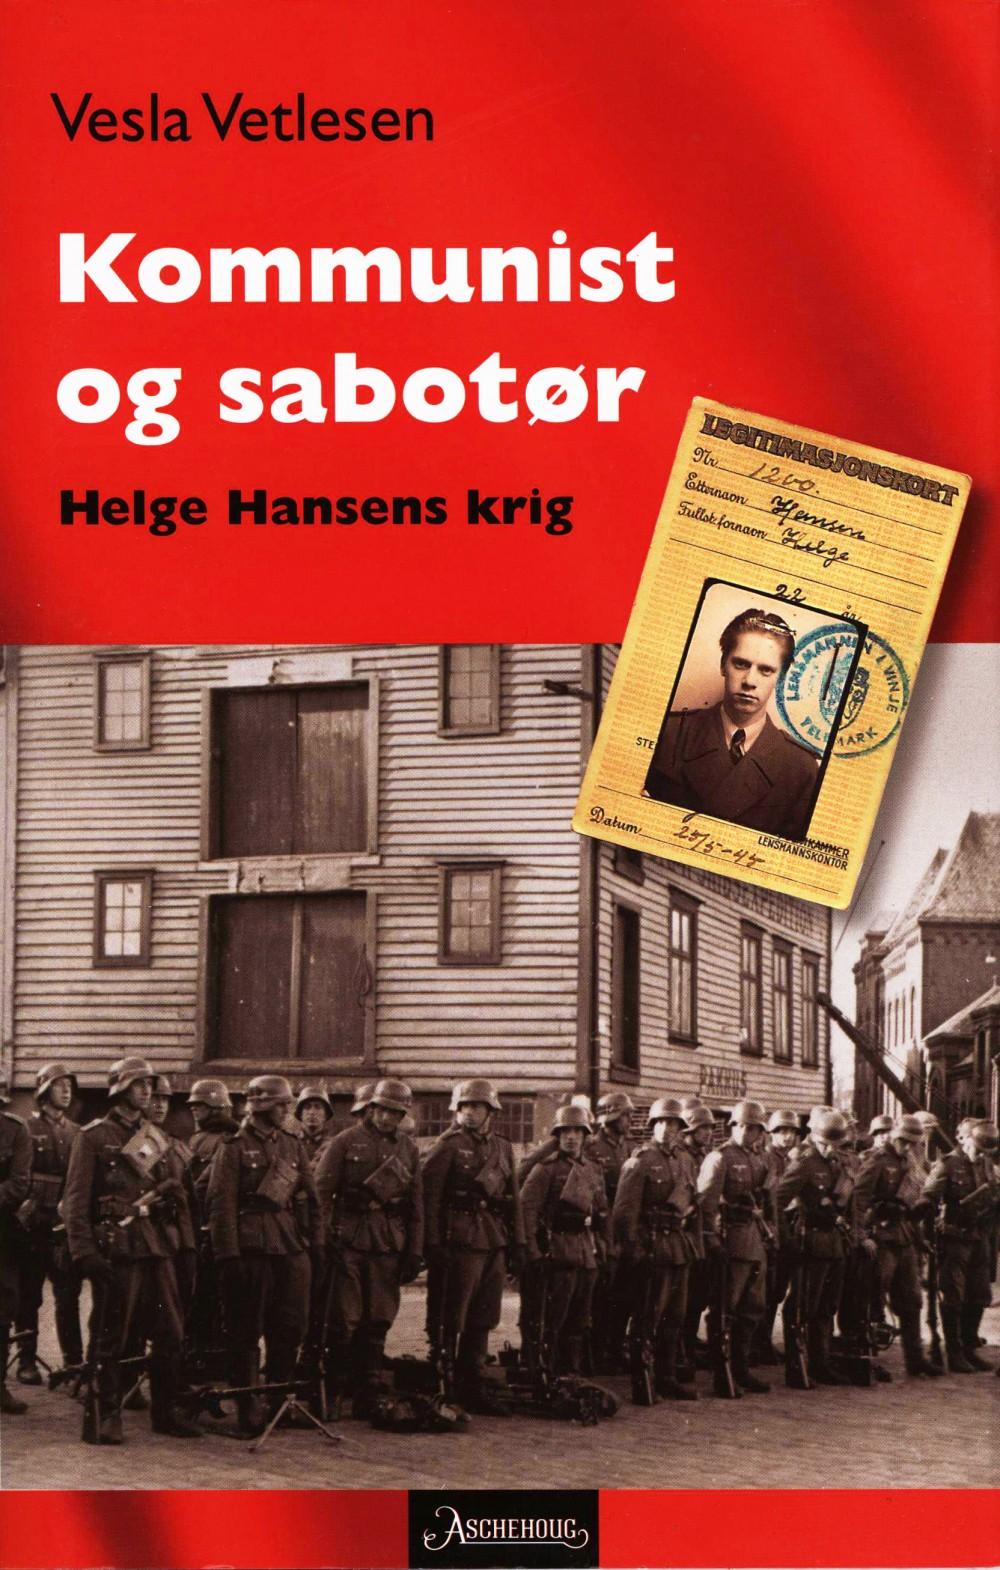 Vesla Vetlesen: Kommunist og sabotør